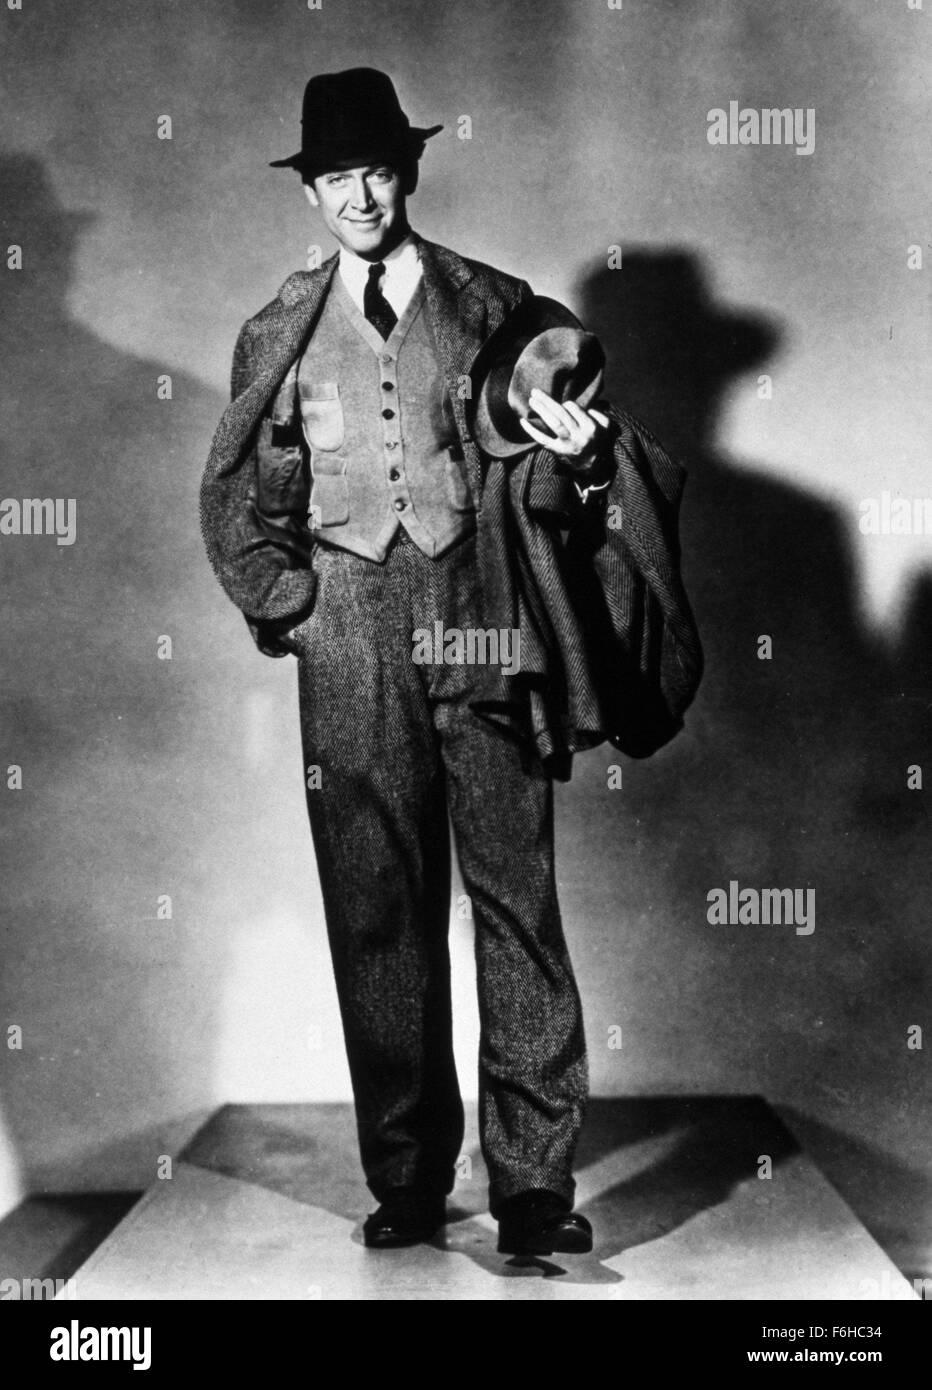 1951, Filmtitel: HARVEY, Regie: HENRY KOSTER, Studio: UNIV, im Bild: HENRY KOSTER. (Bild Kredit: SNAP) Stockbild